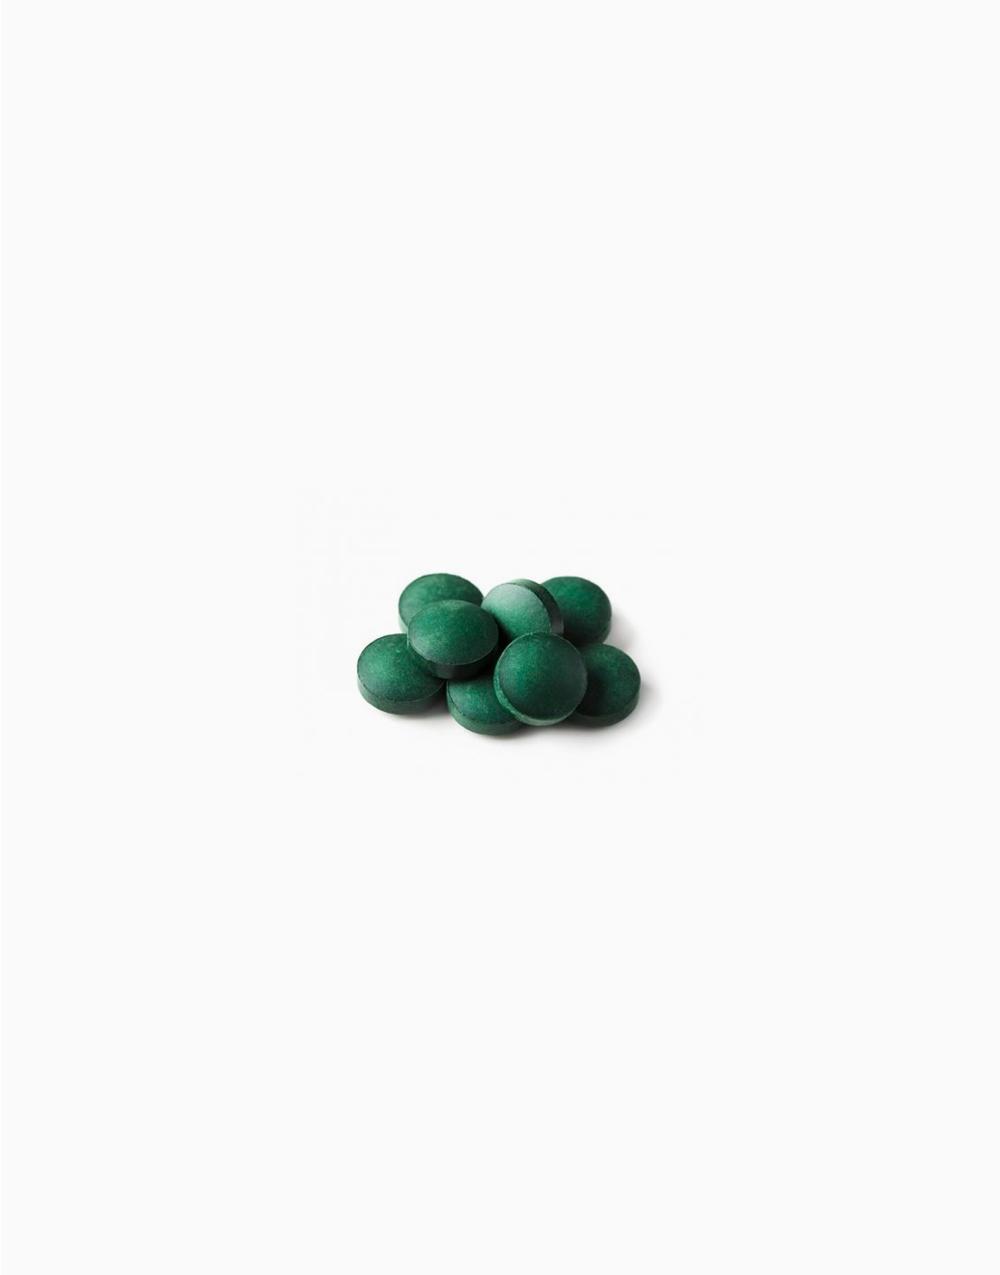 Spirulina Tablets 250mg (1000 tablets) by Roarganics